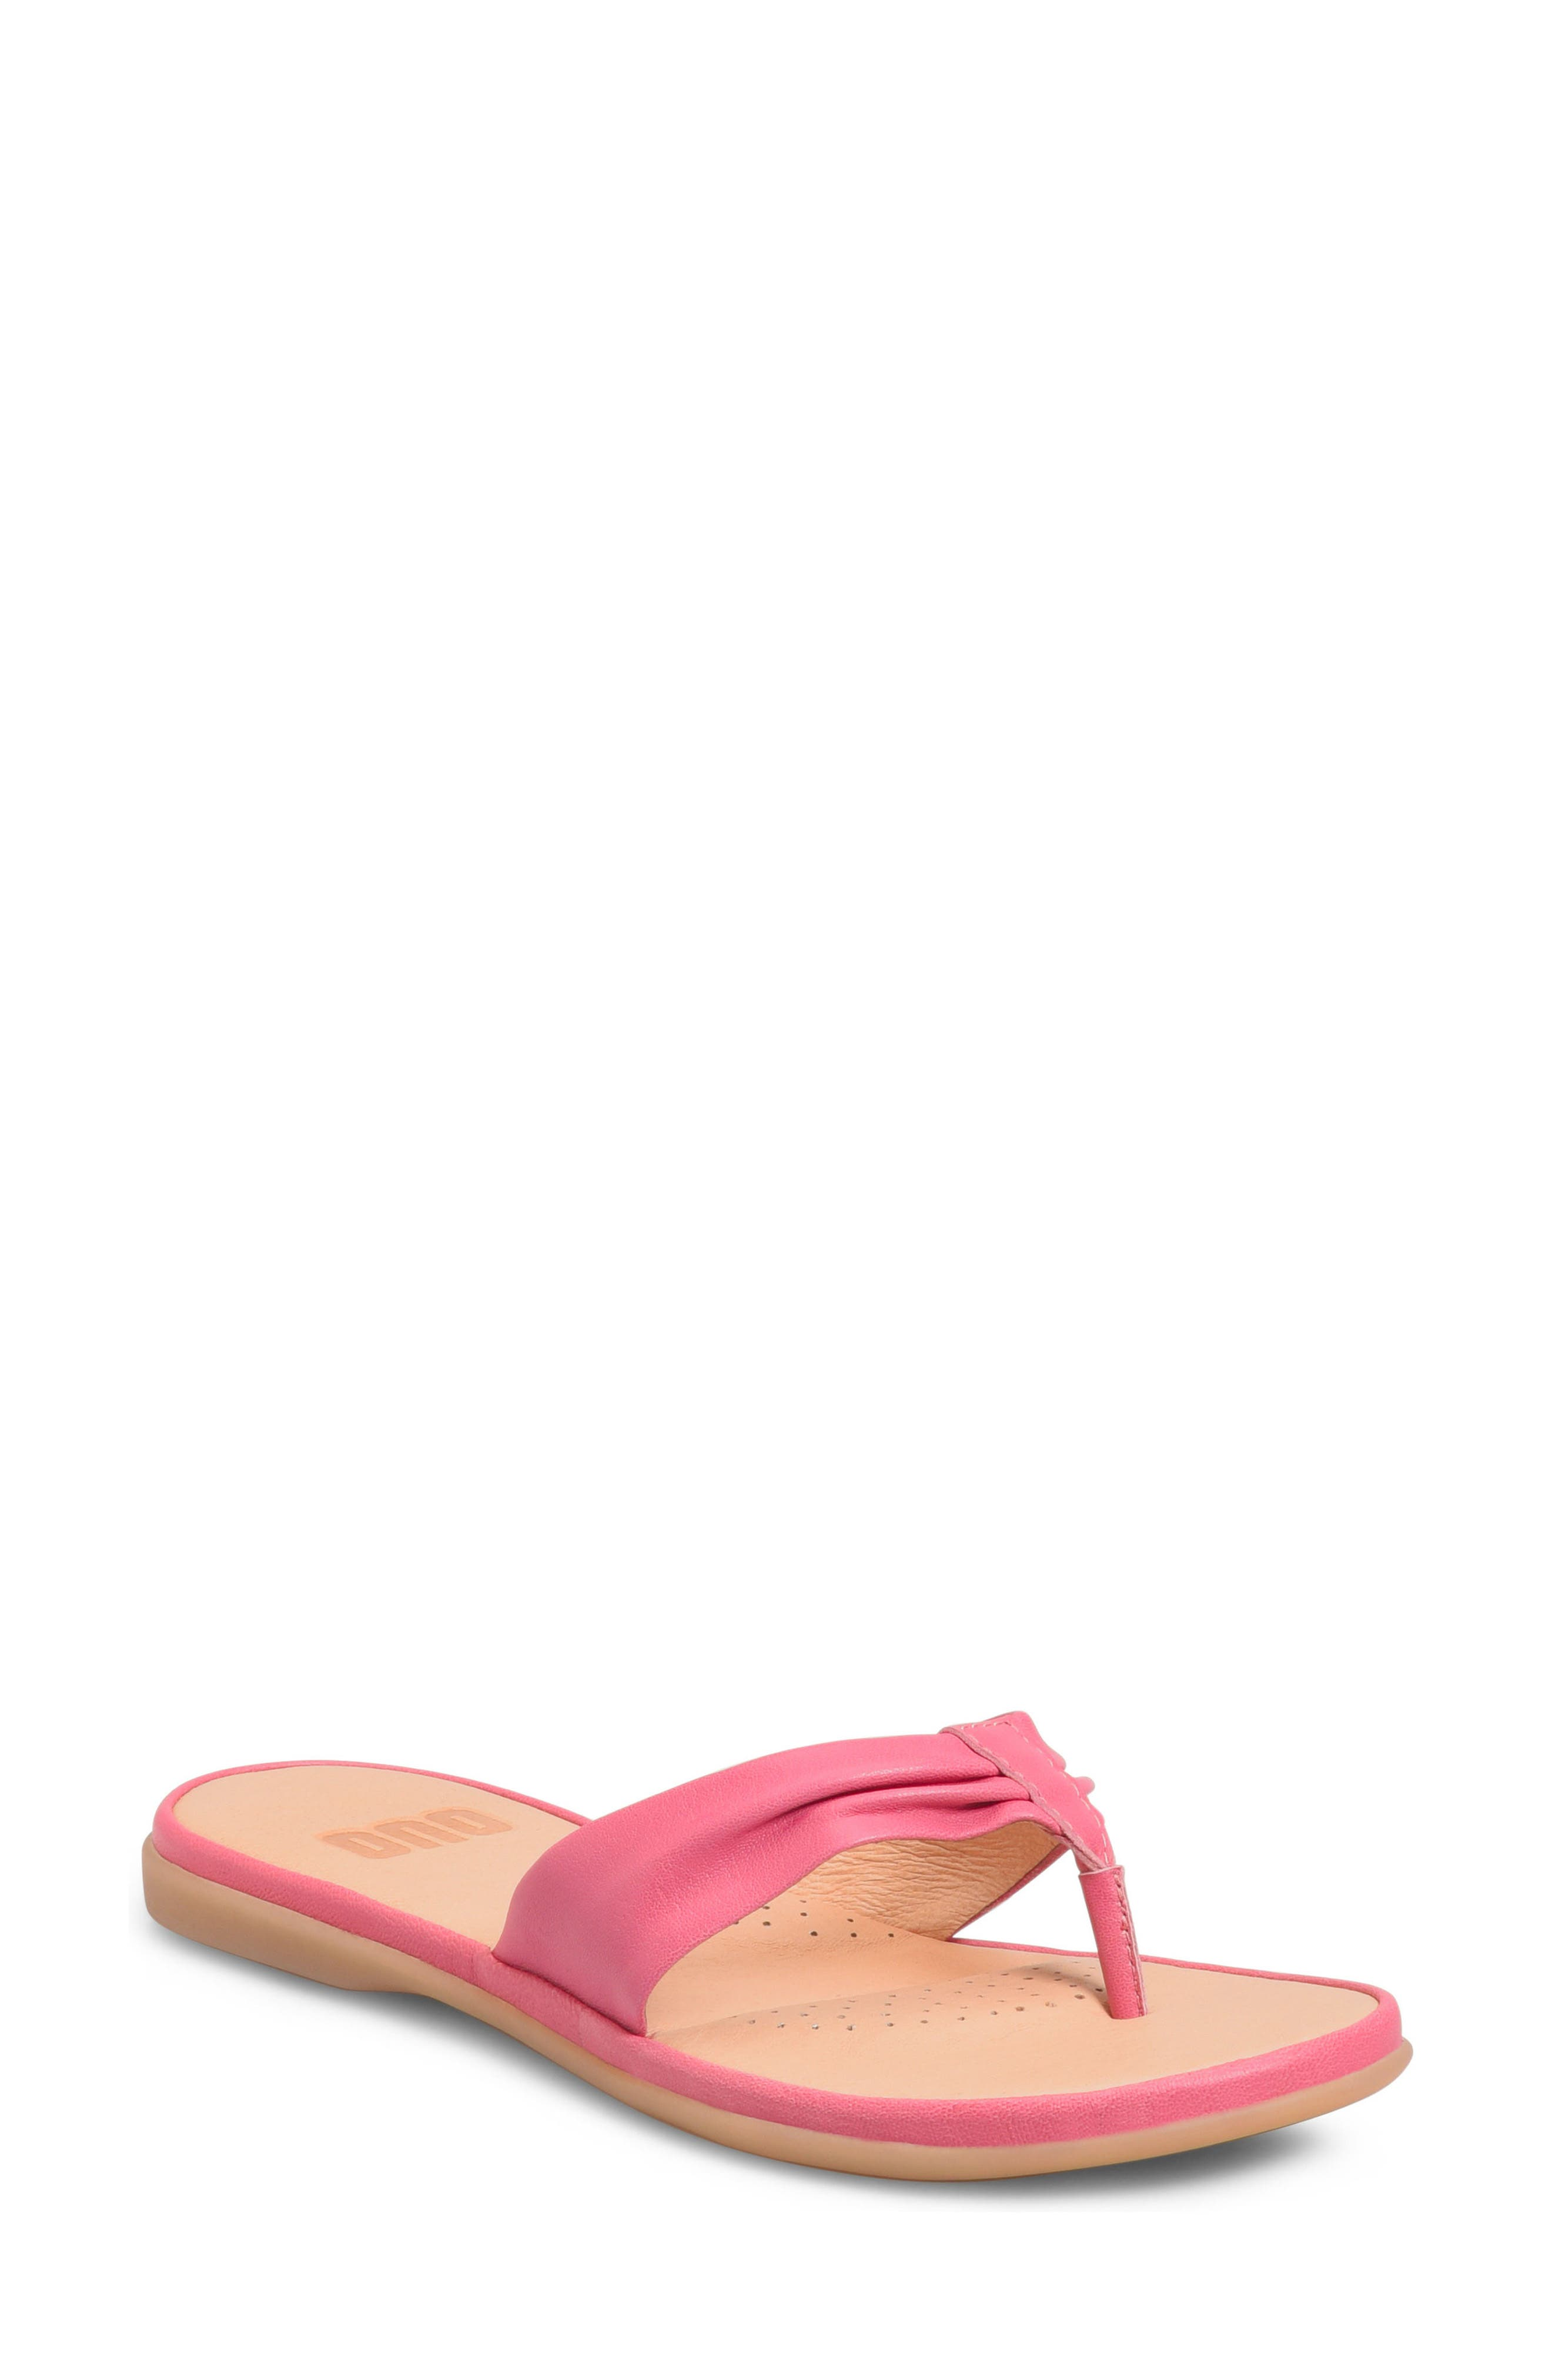 Liv Flip Flop,                             Main thumbnail 1, color,                             Dark Pink Leather